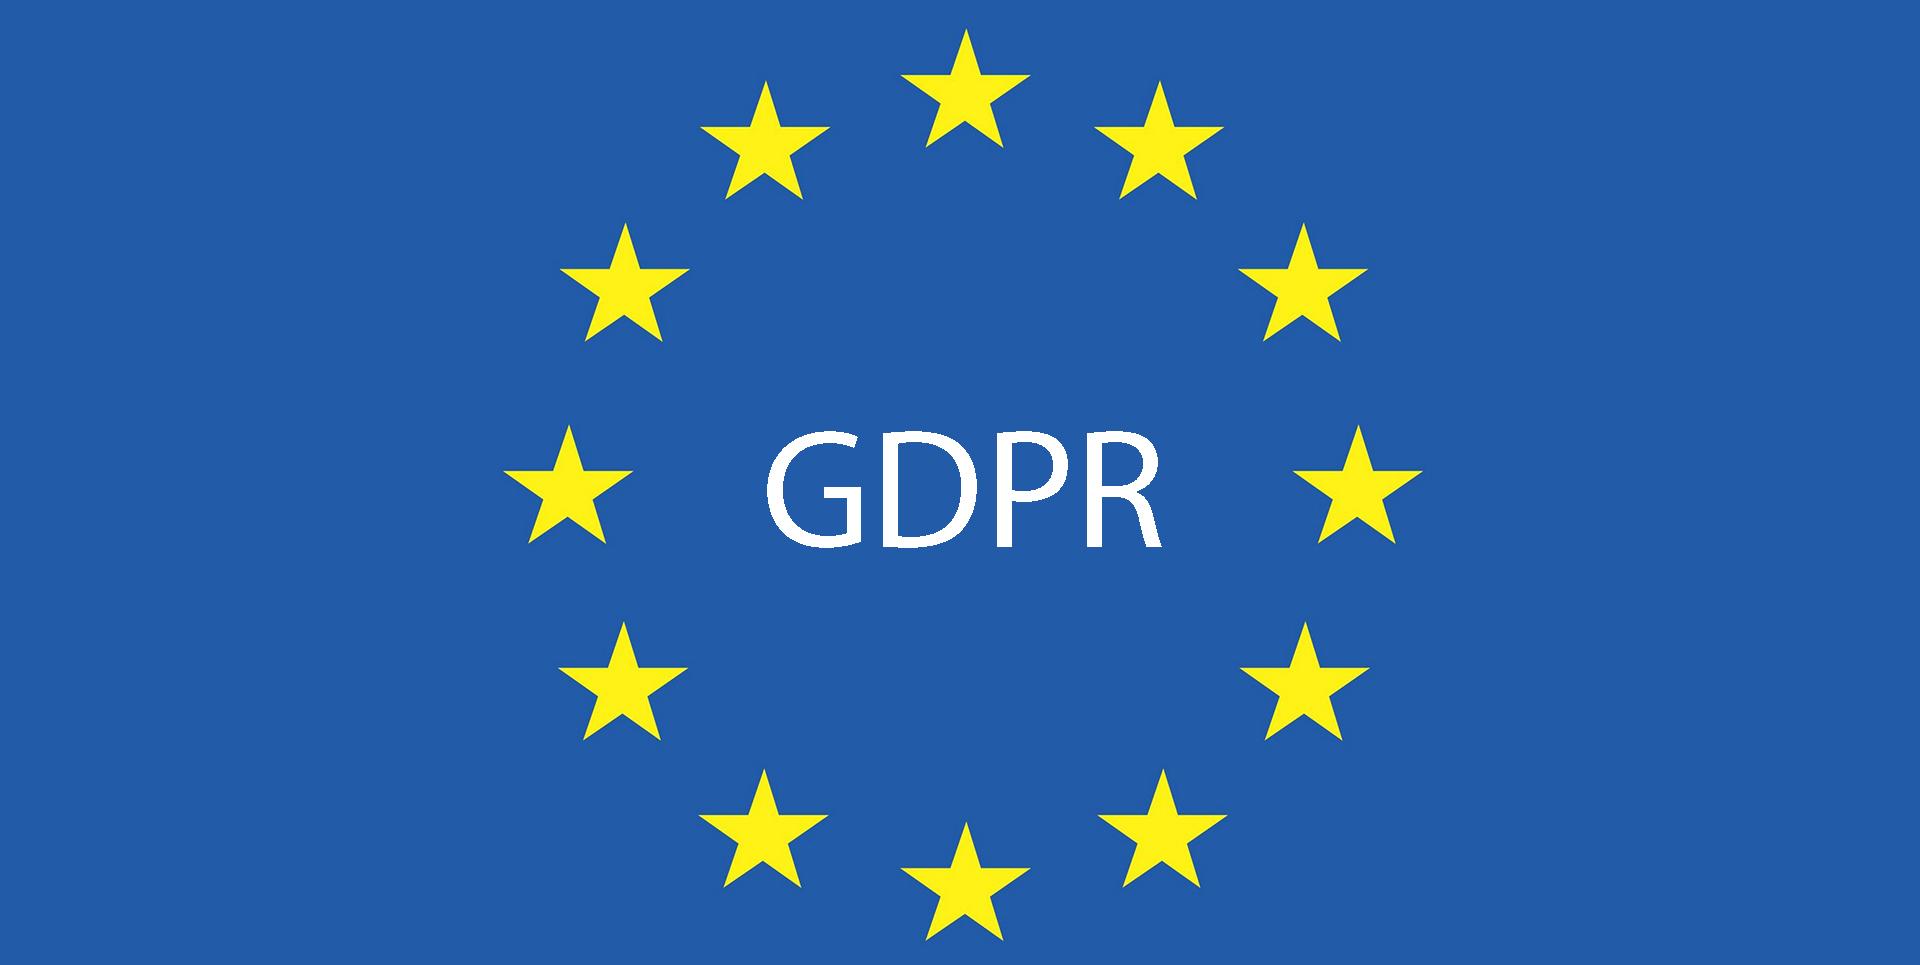 Magento GDPR: la guida completa